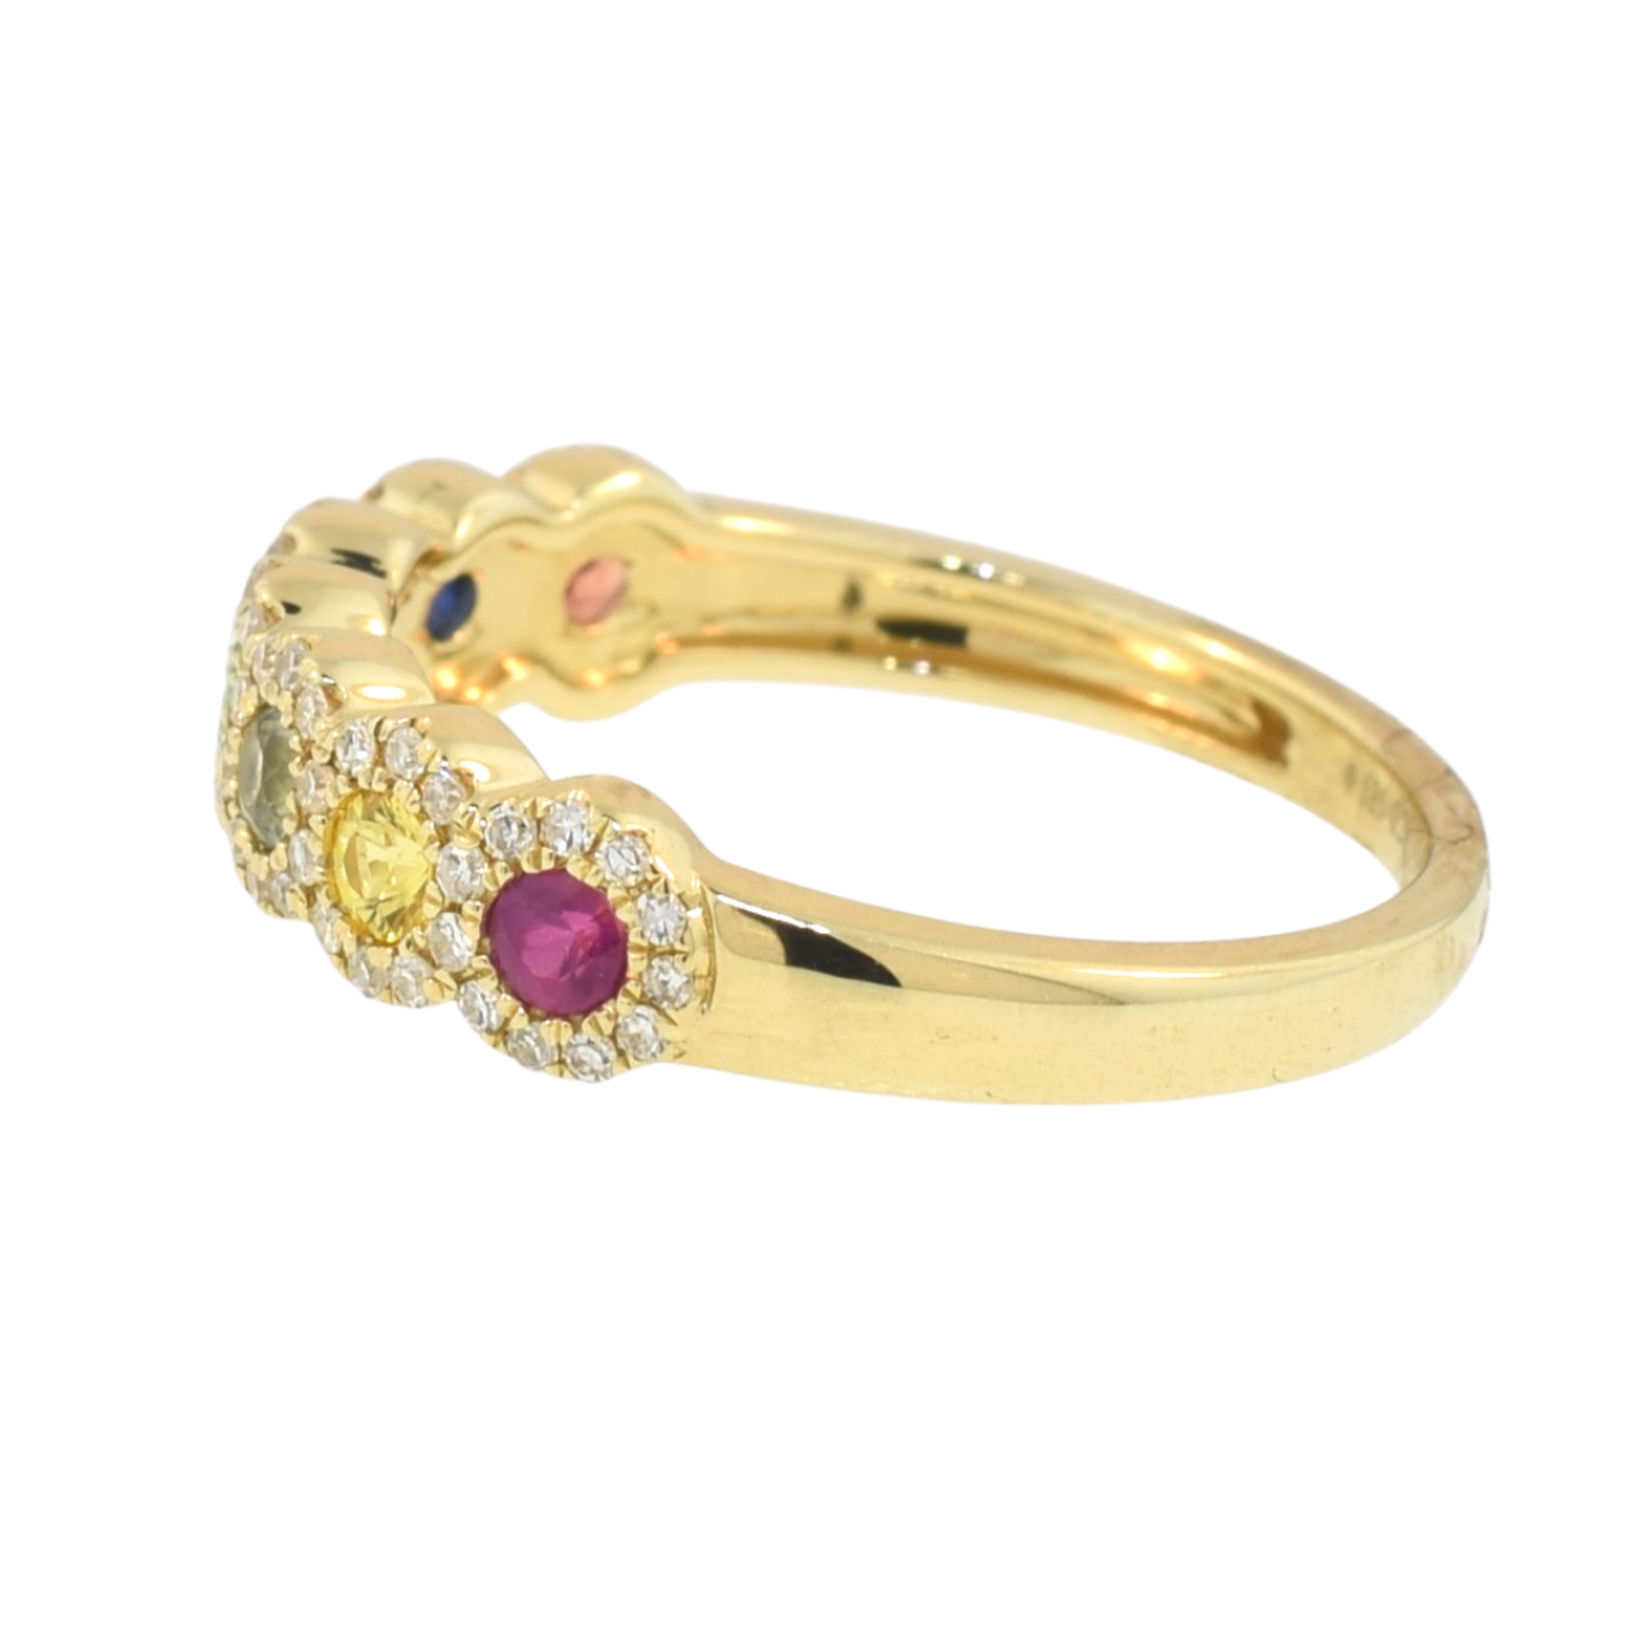 Gemstone and Diamond Rainbow Ring